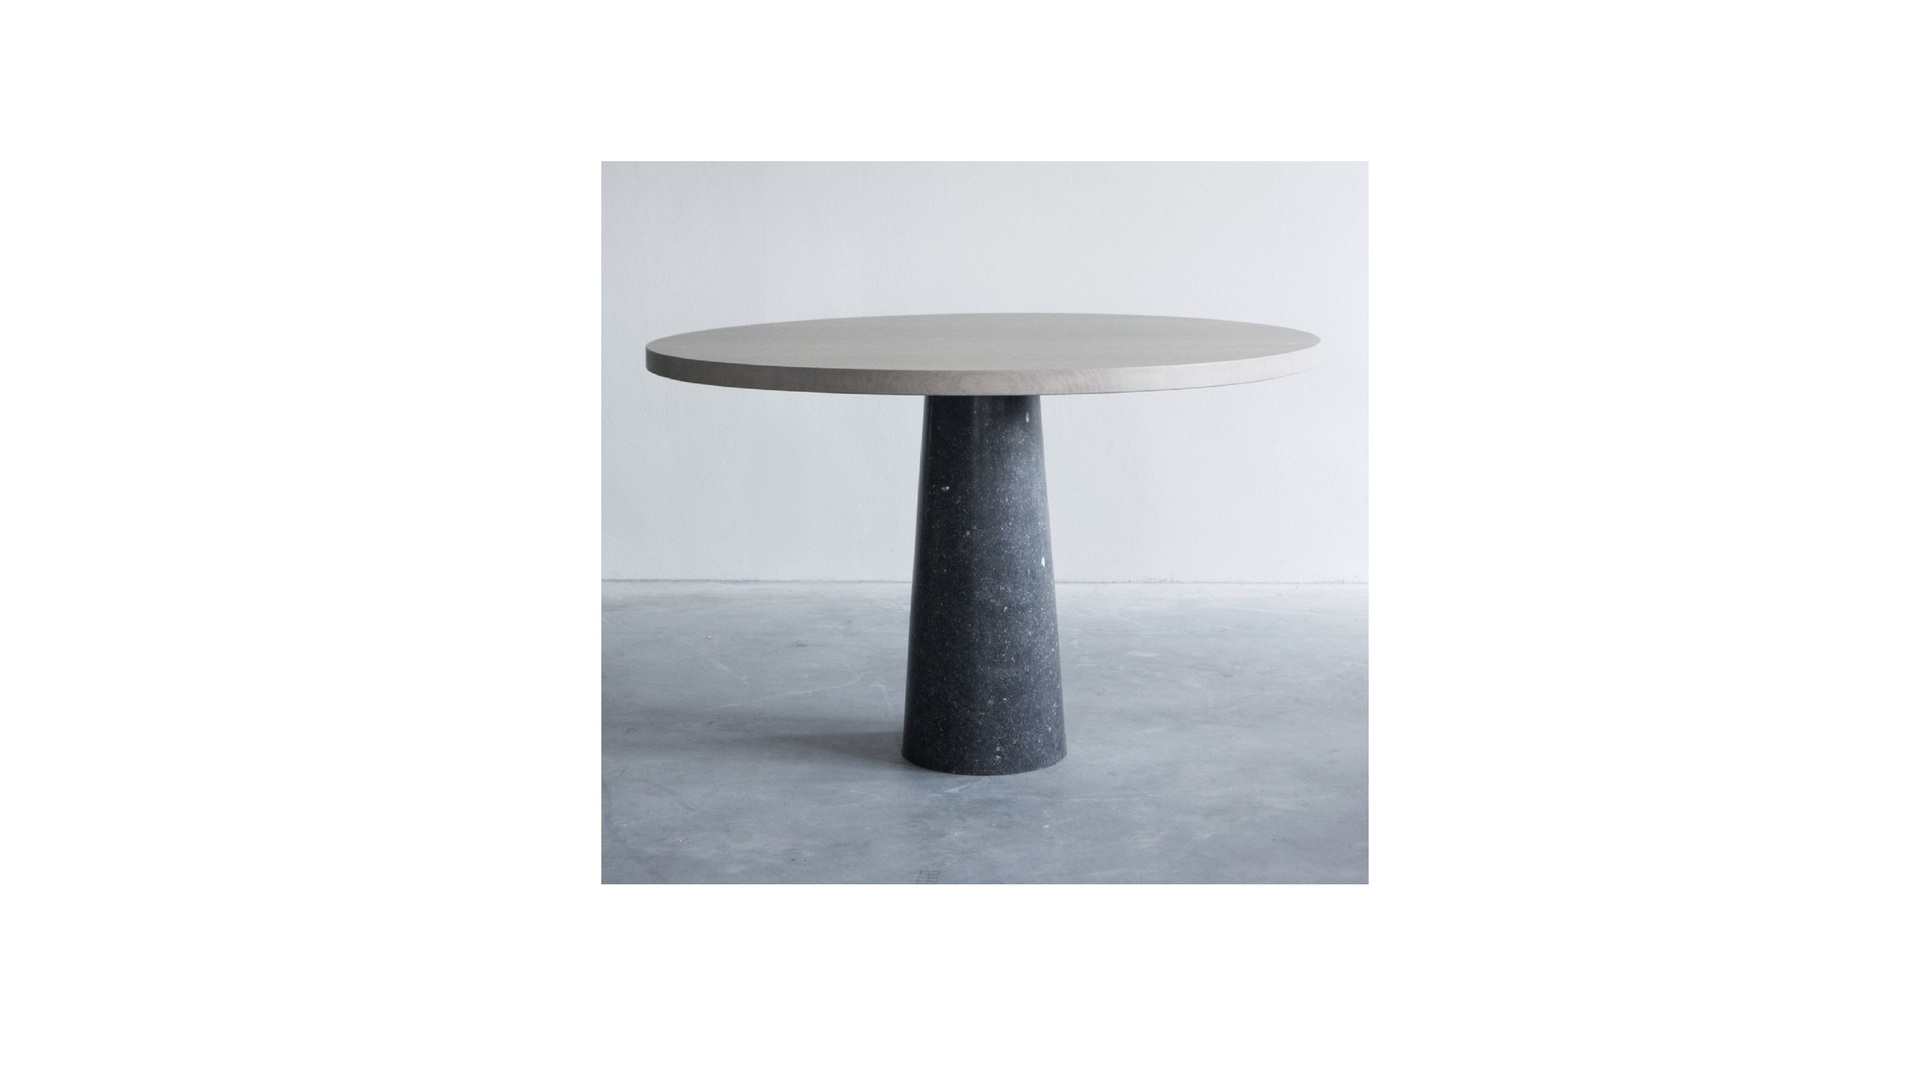 Stone table with Belgian blue limestone (1) klein.jpg